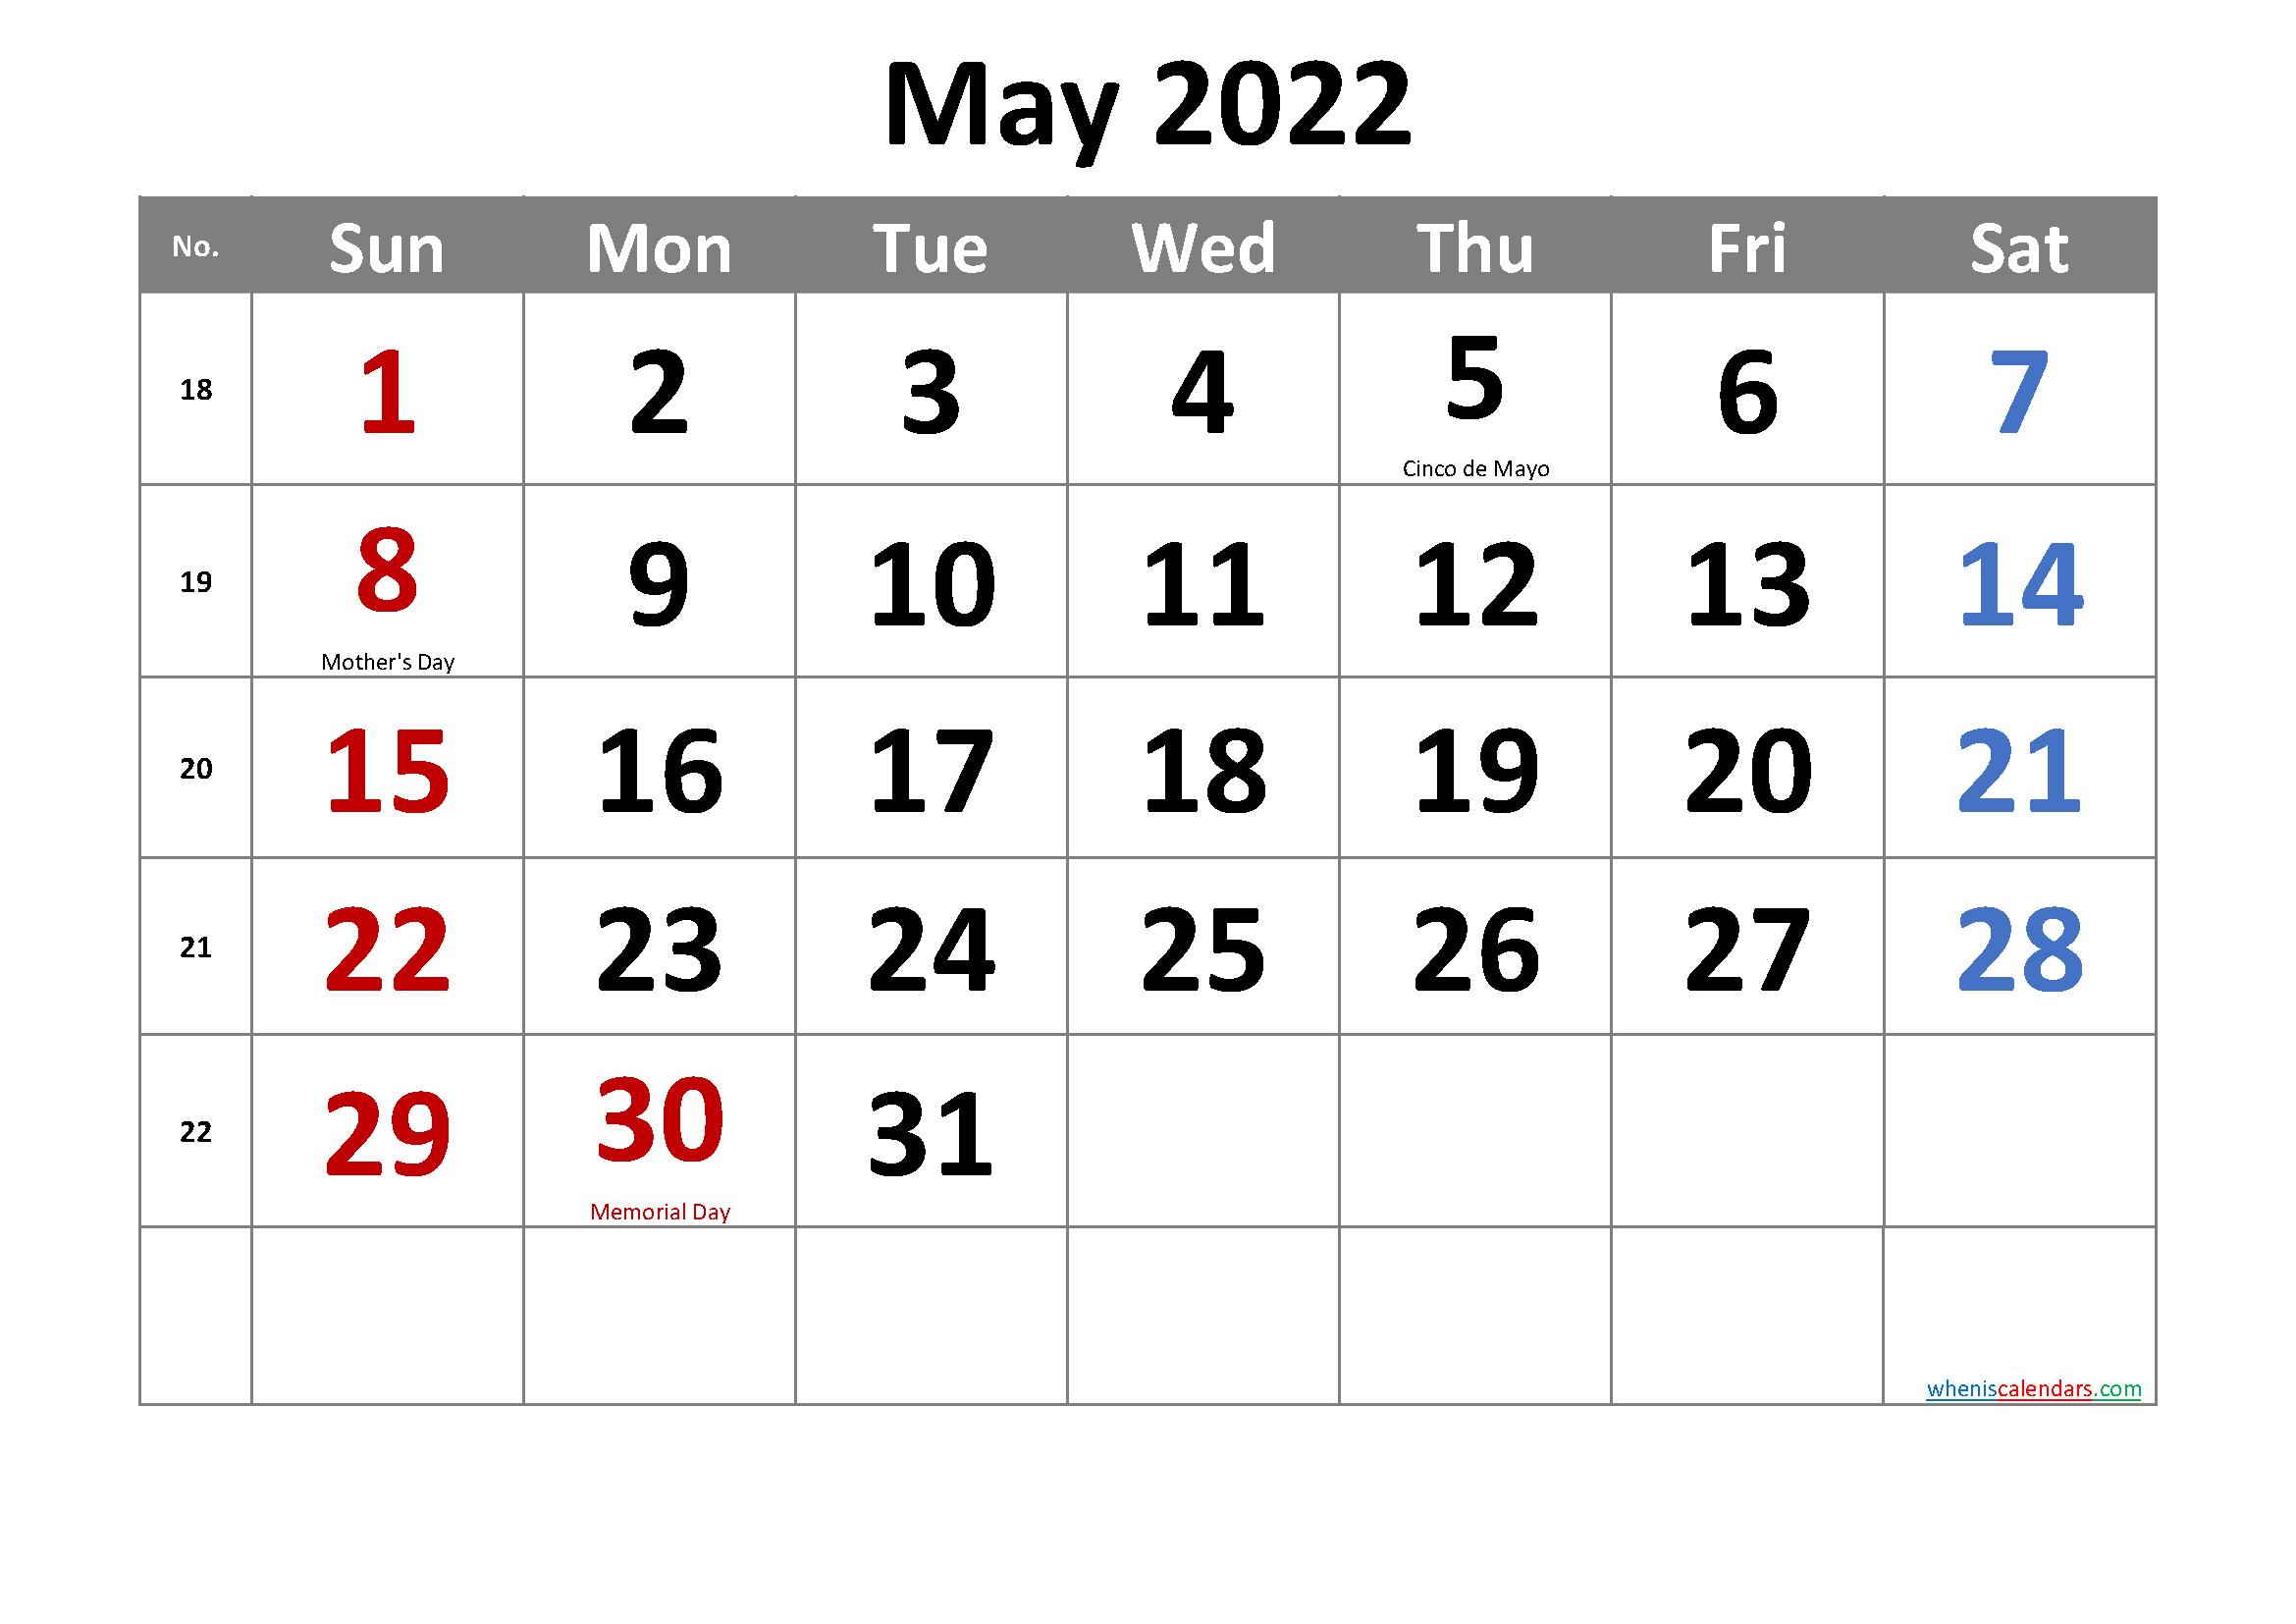 Free May 2022 Calendar Printable intended for Printable Mayl 2022 Calendar